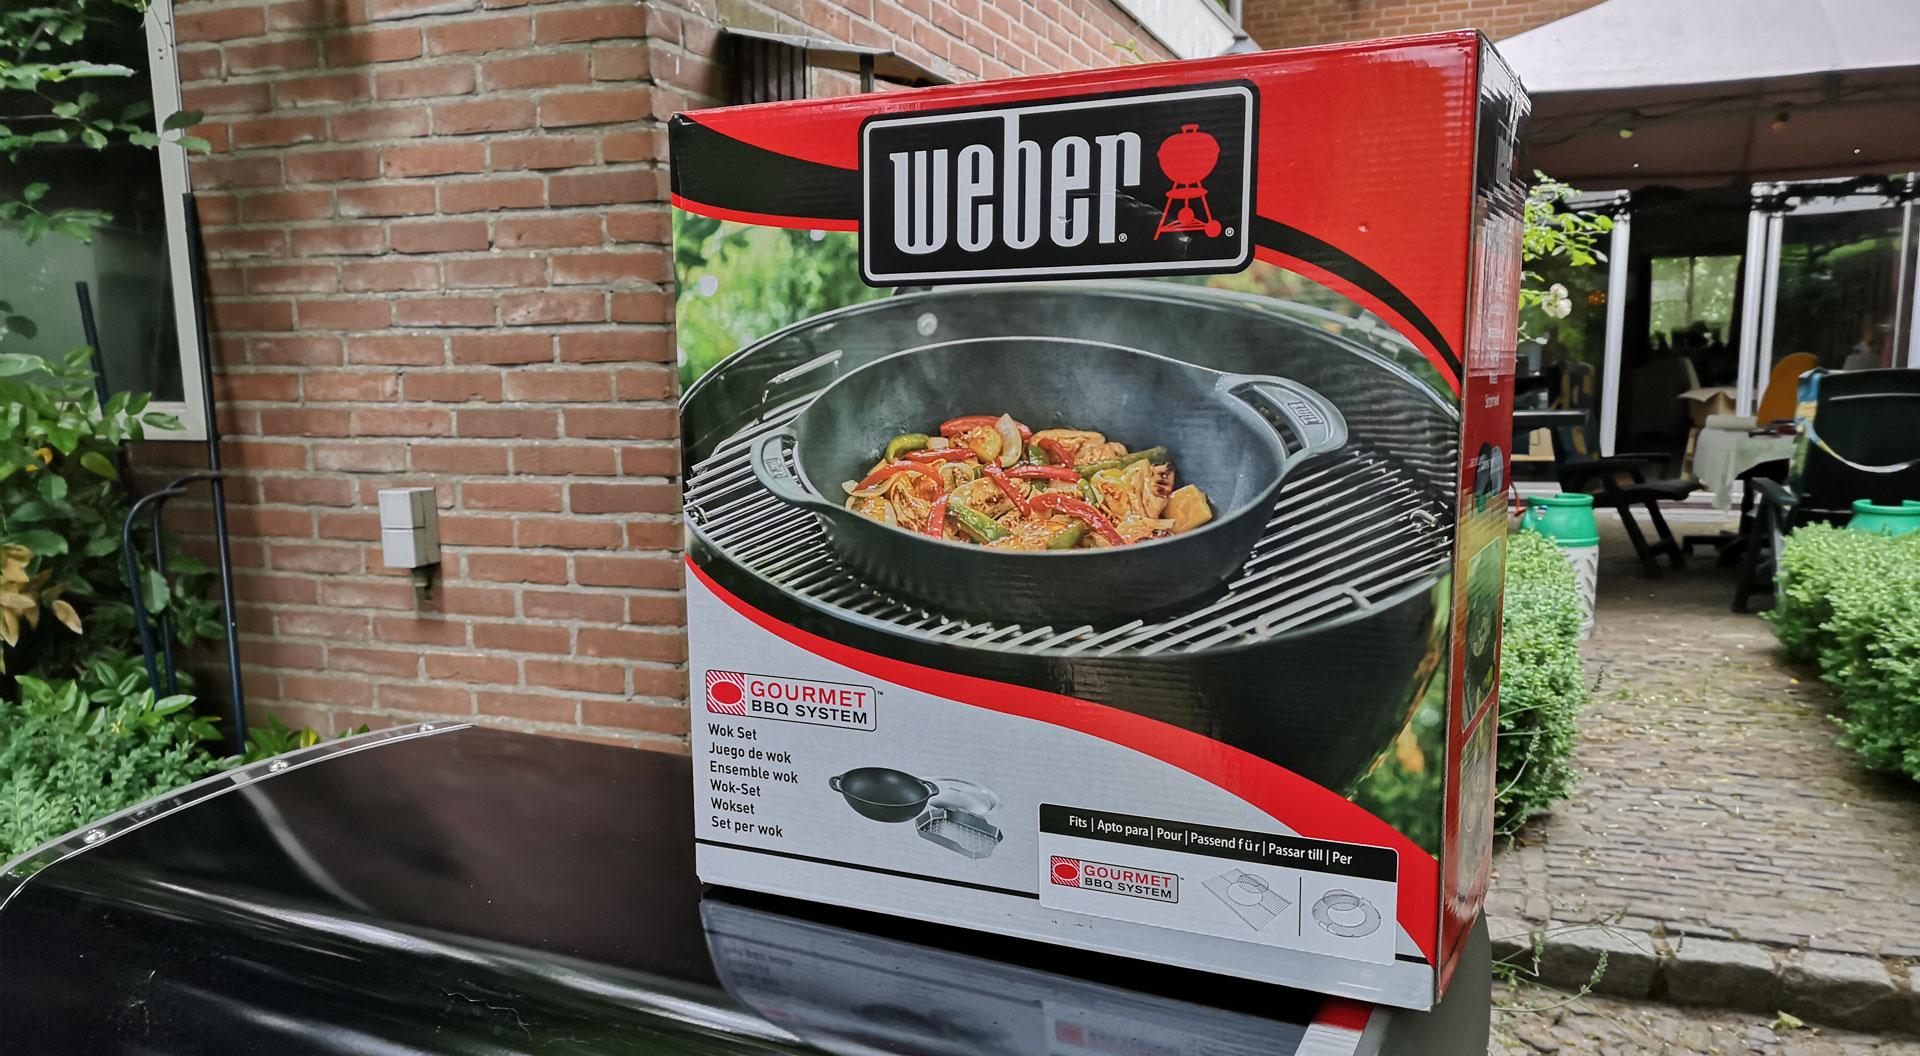 Wokset met stoomrek | Bereiden | Gourmet BBQ system